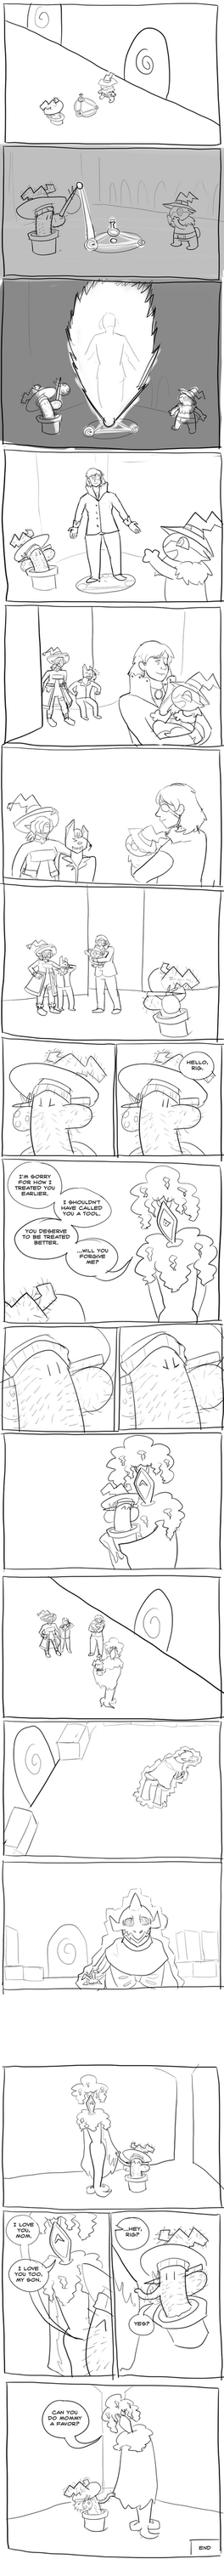 Wizard Palooza OCT: Round 3 Page 11 by PSIJoel